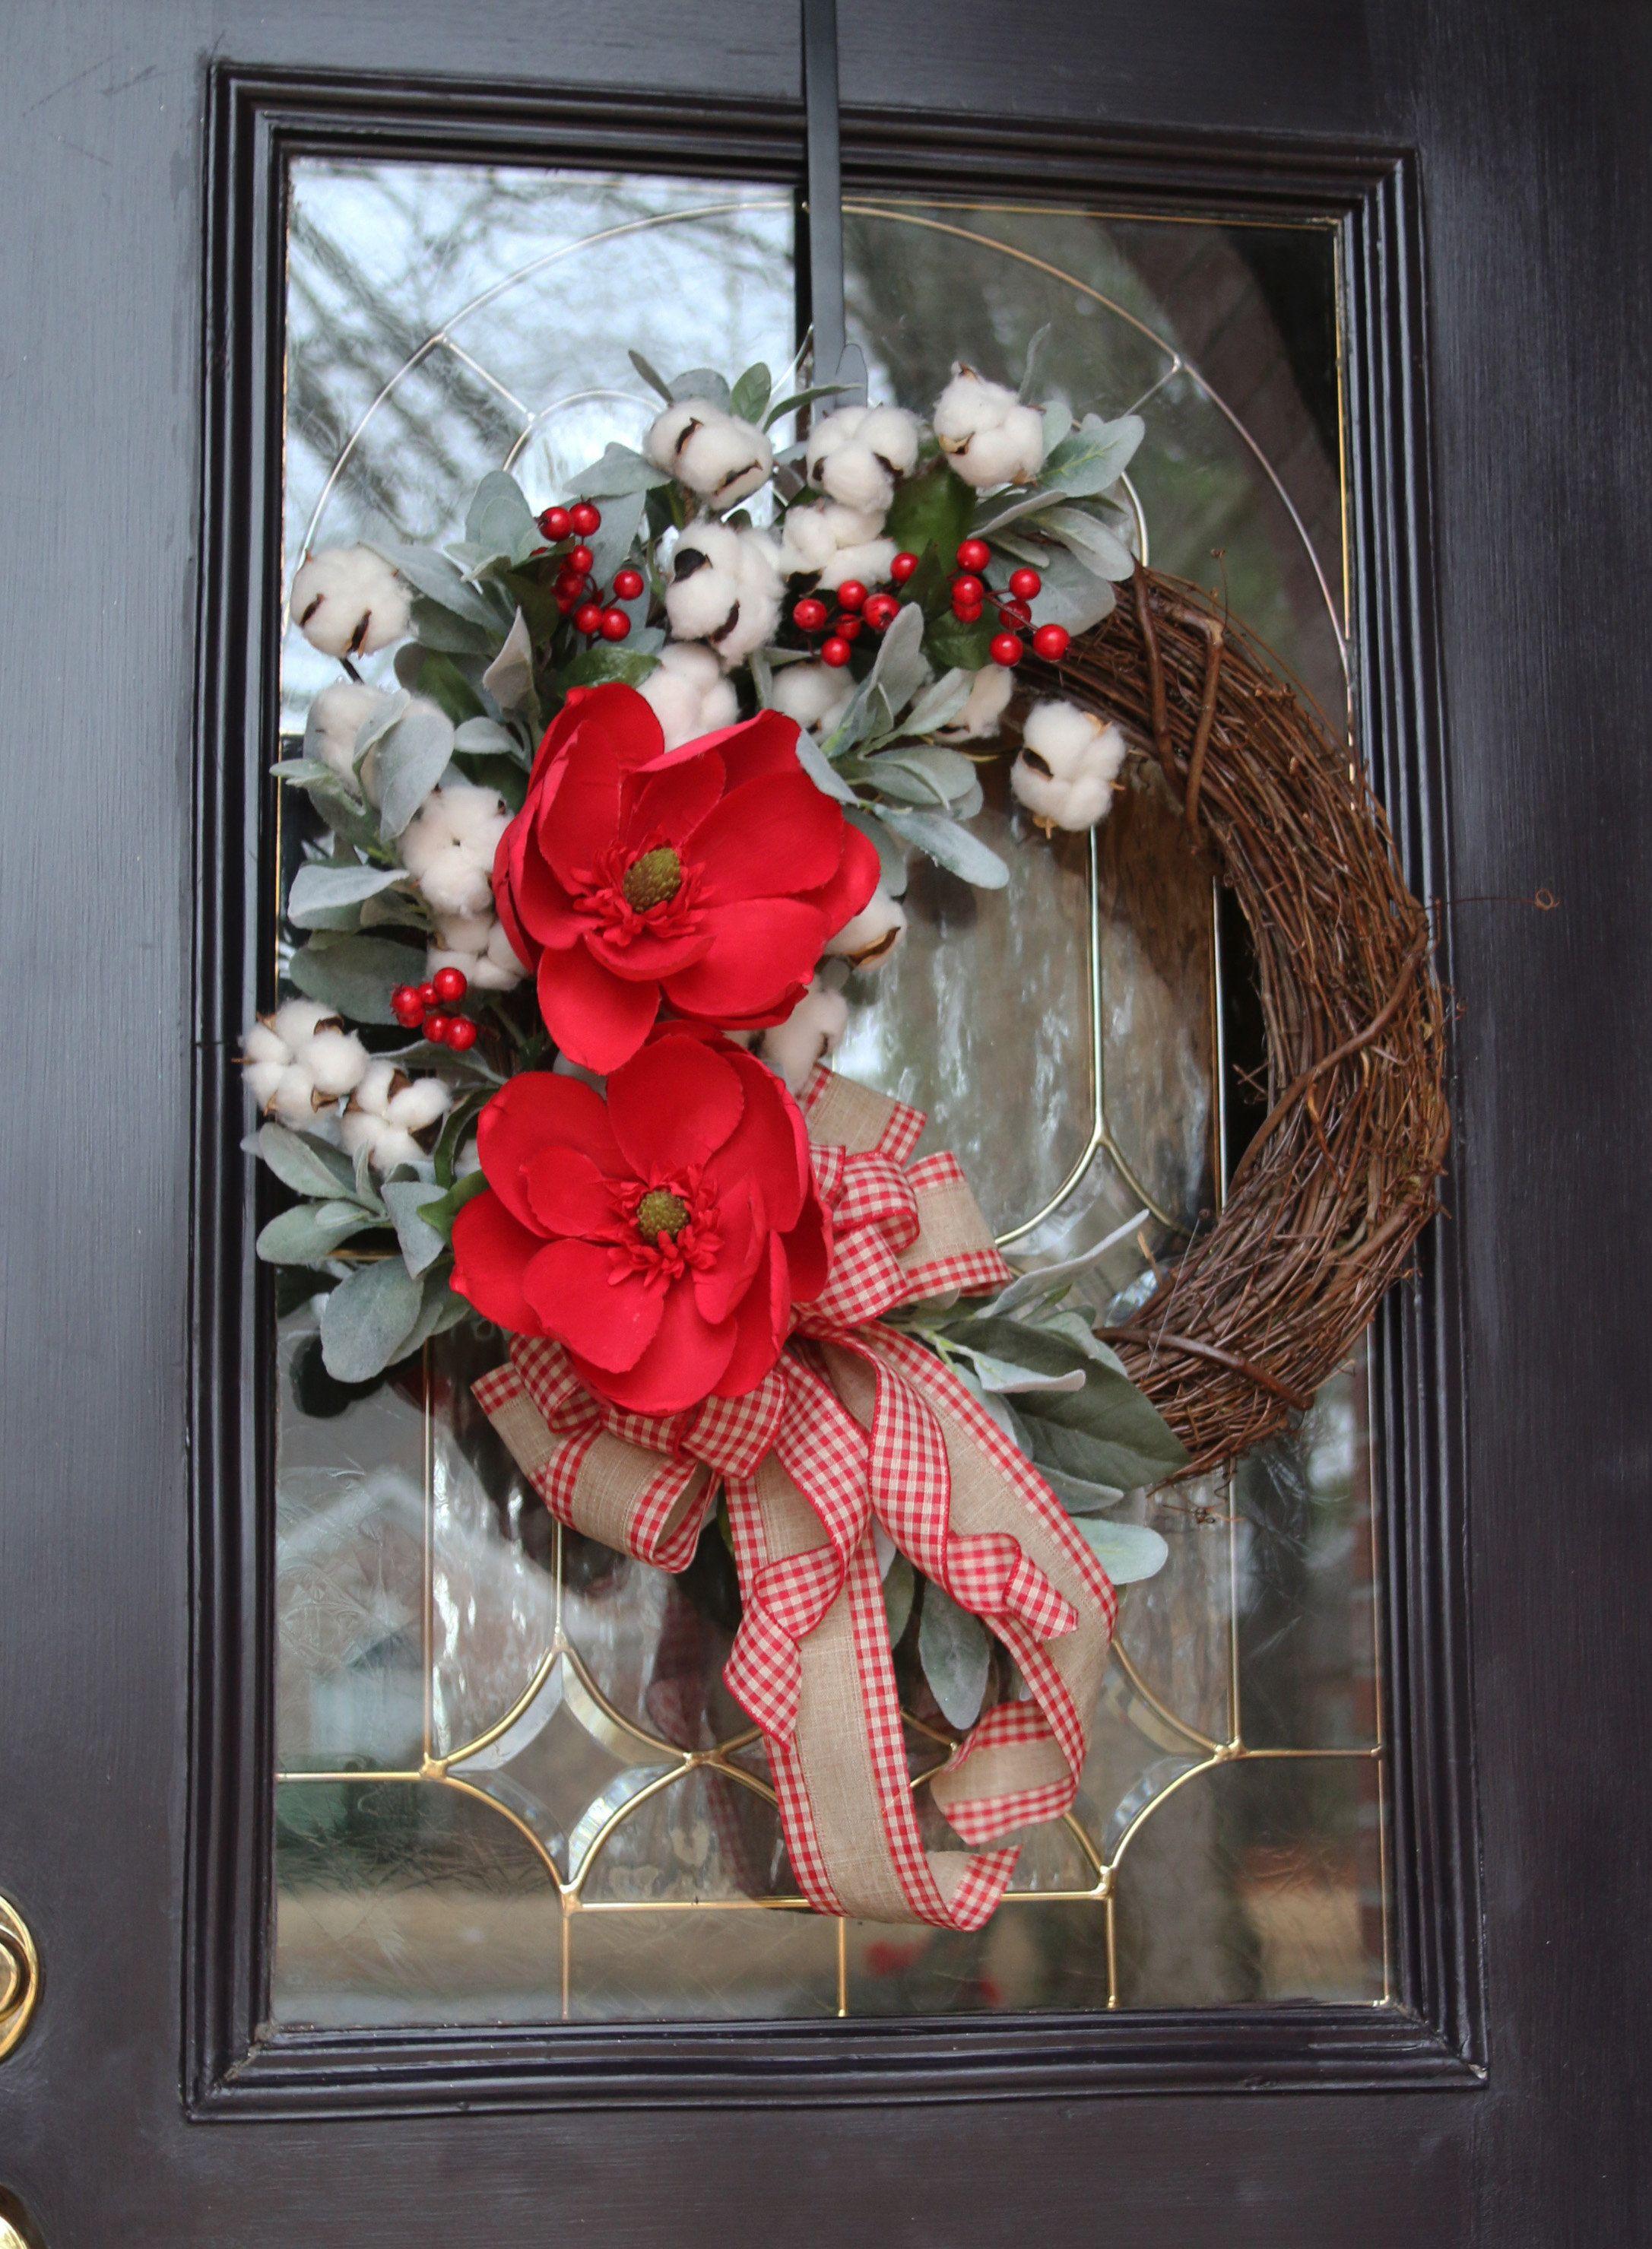 Winter Farmhouse wreath, Valentine's Door Wreath, Magnolia & Cotton Winter Decor, Double Door Valentine Wreath, Rustic Country Winter Wreath #doubledoorwreaths